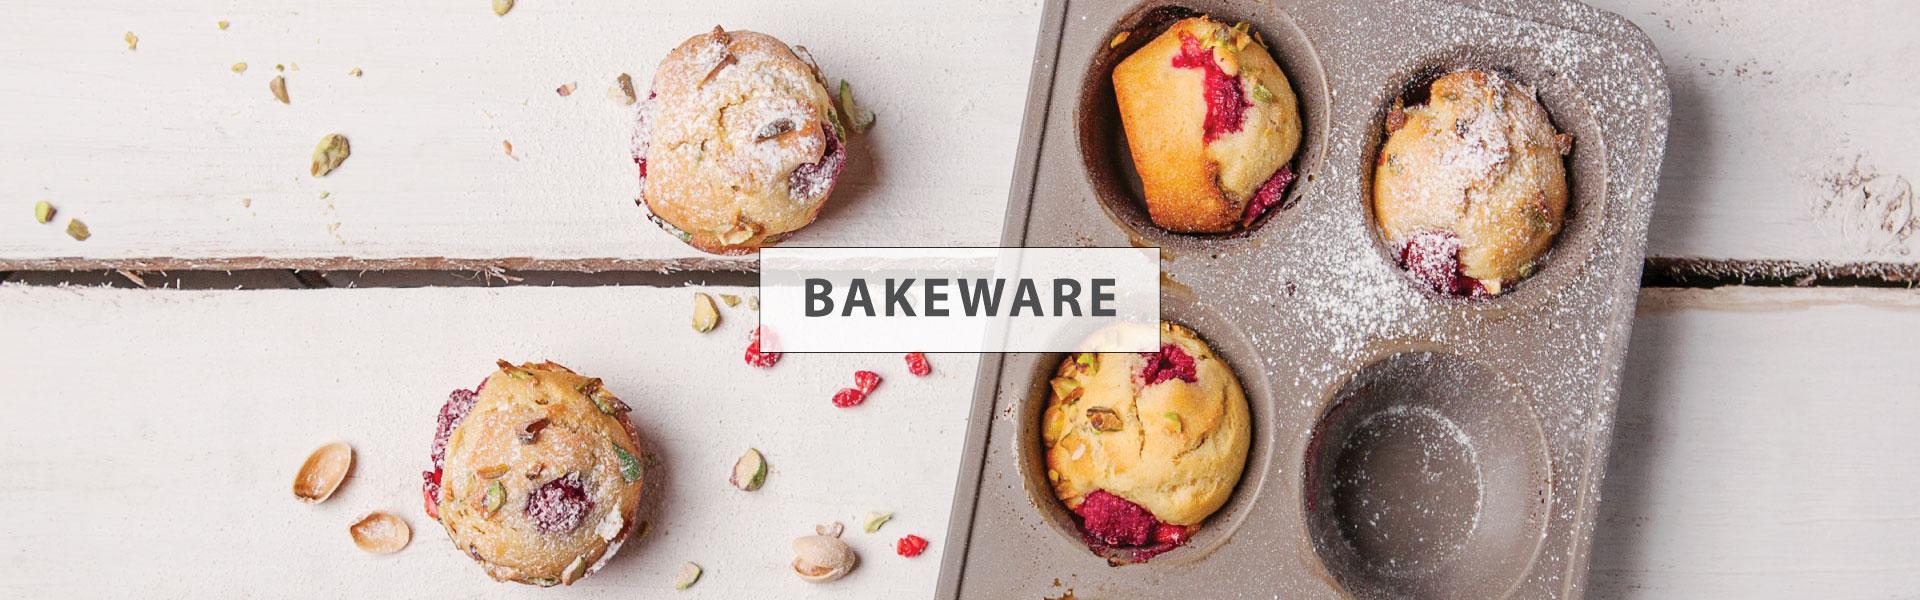 Buy Bakeware Online Restaurant Catering Home Banks Kitchen